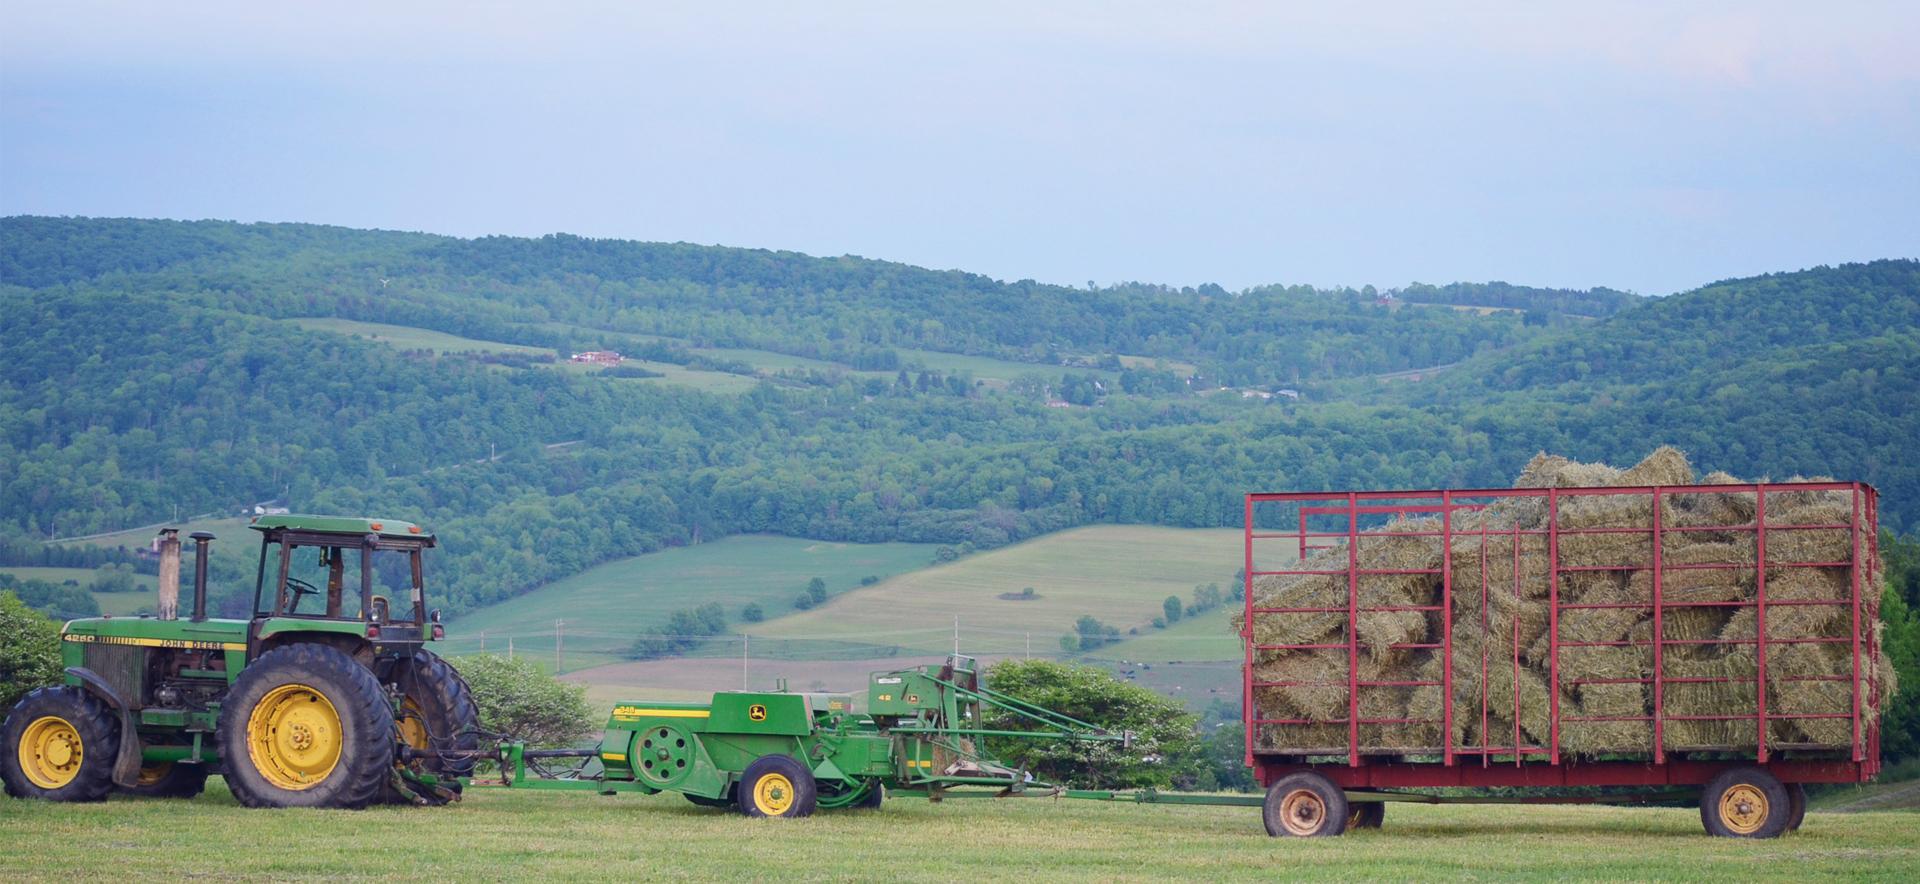 TV-Hoempage-FarmingInField